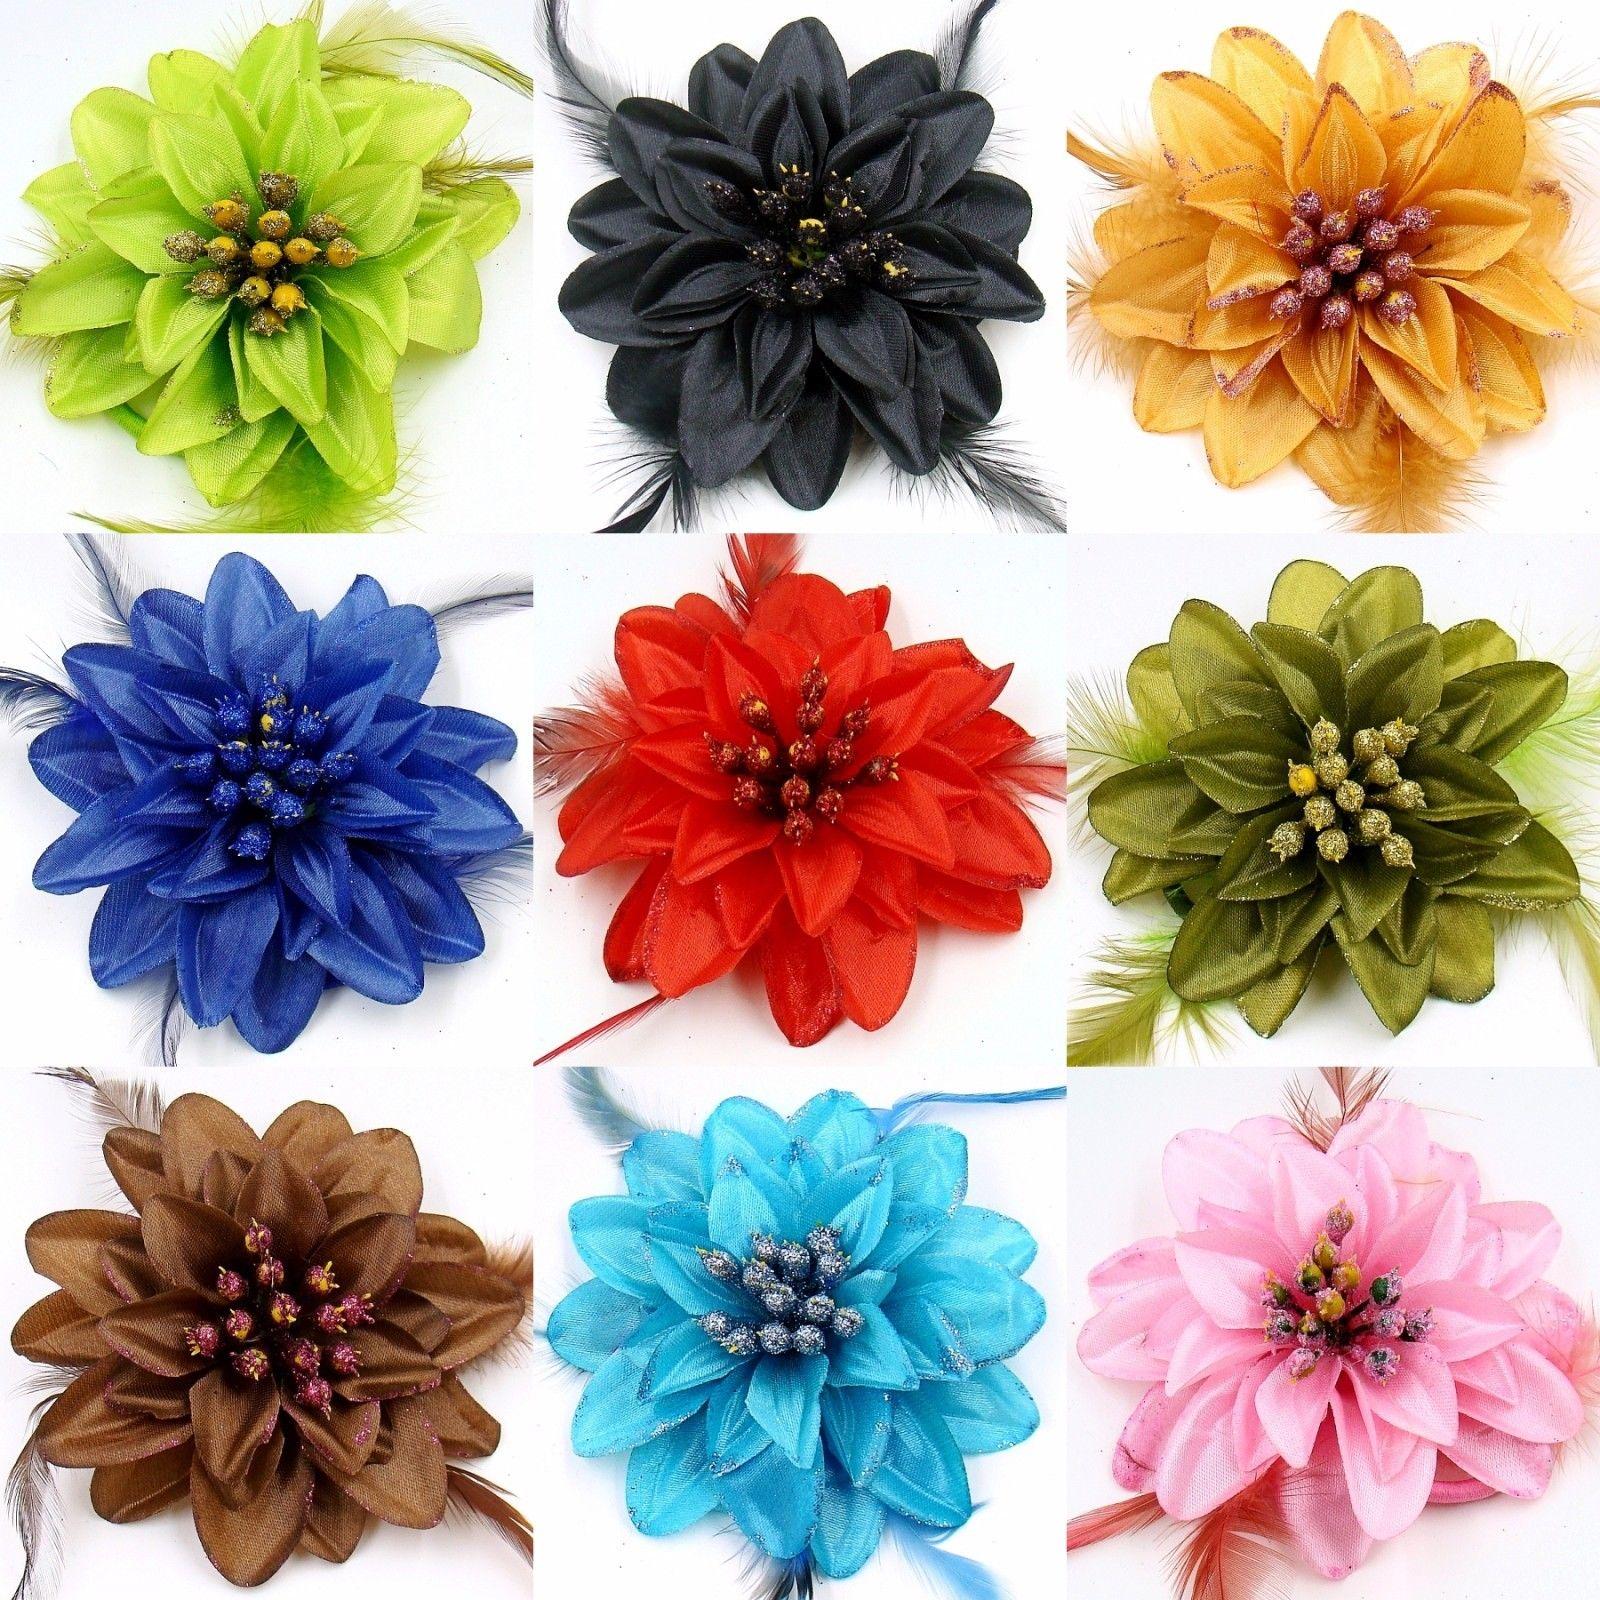 HAARBLUME HAARGUMMI Ansteckblume 2 in 1 Haarblüte Federn Zopfband Brosche